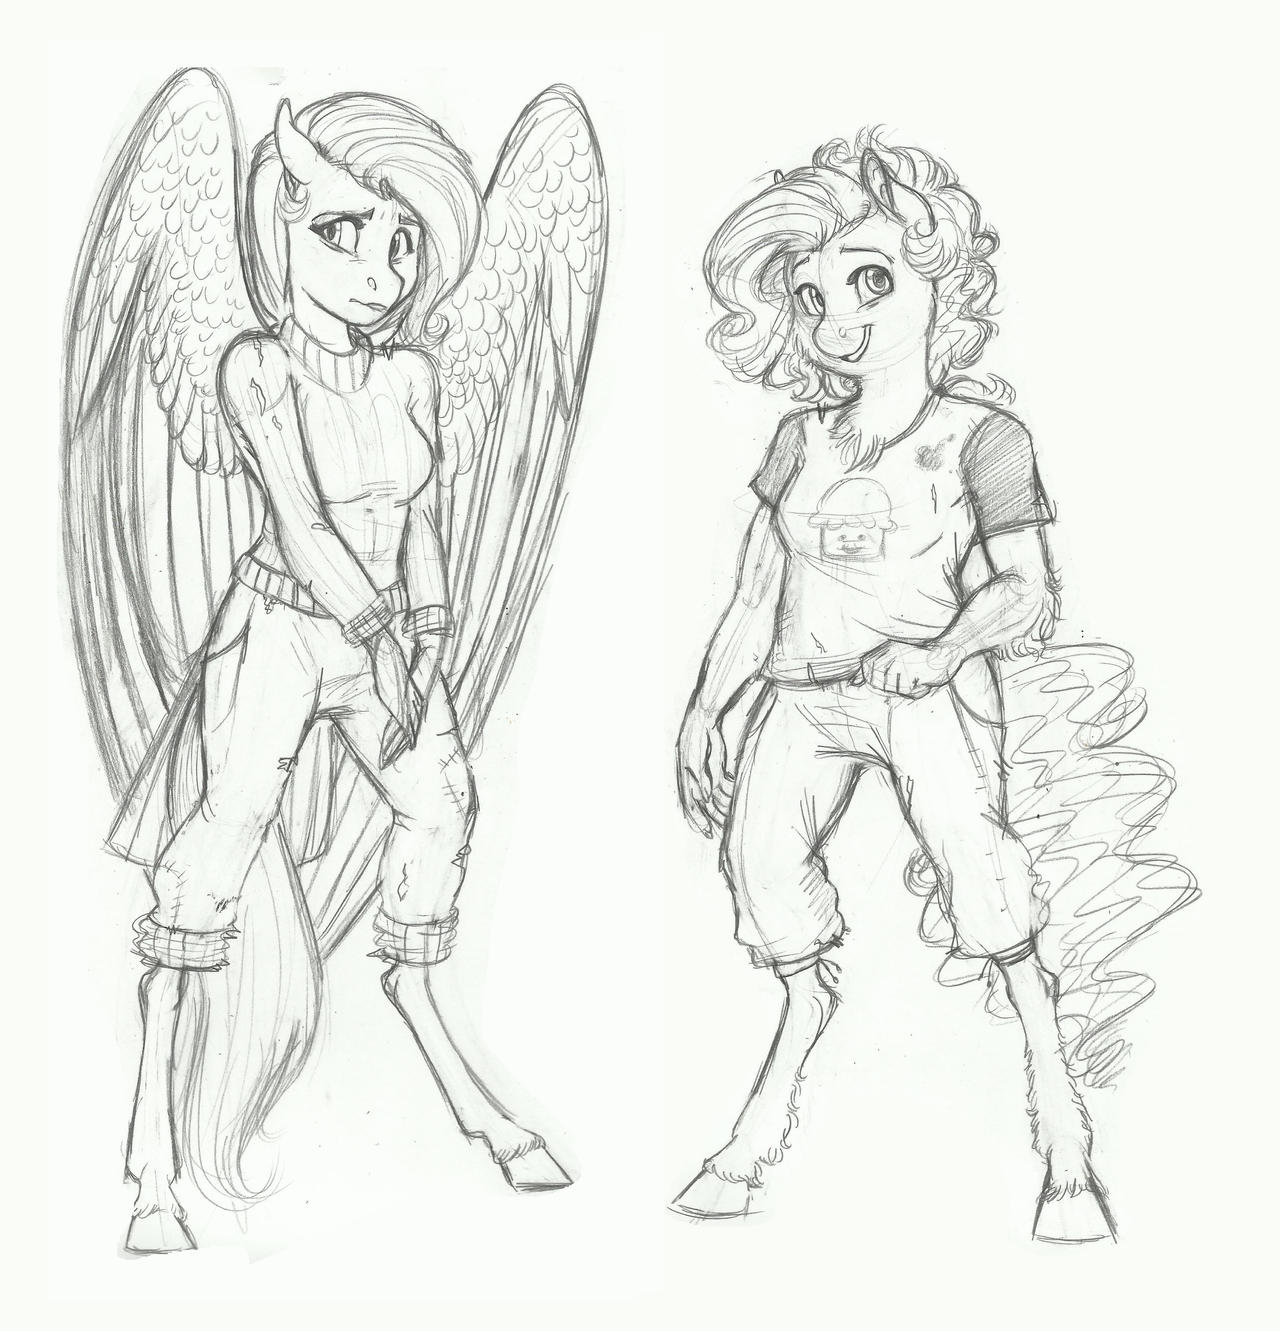 Zombie AU Doodle- Fluttershy and Pinkie Pie